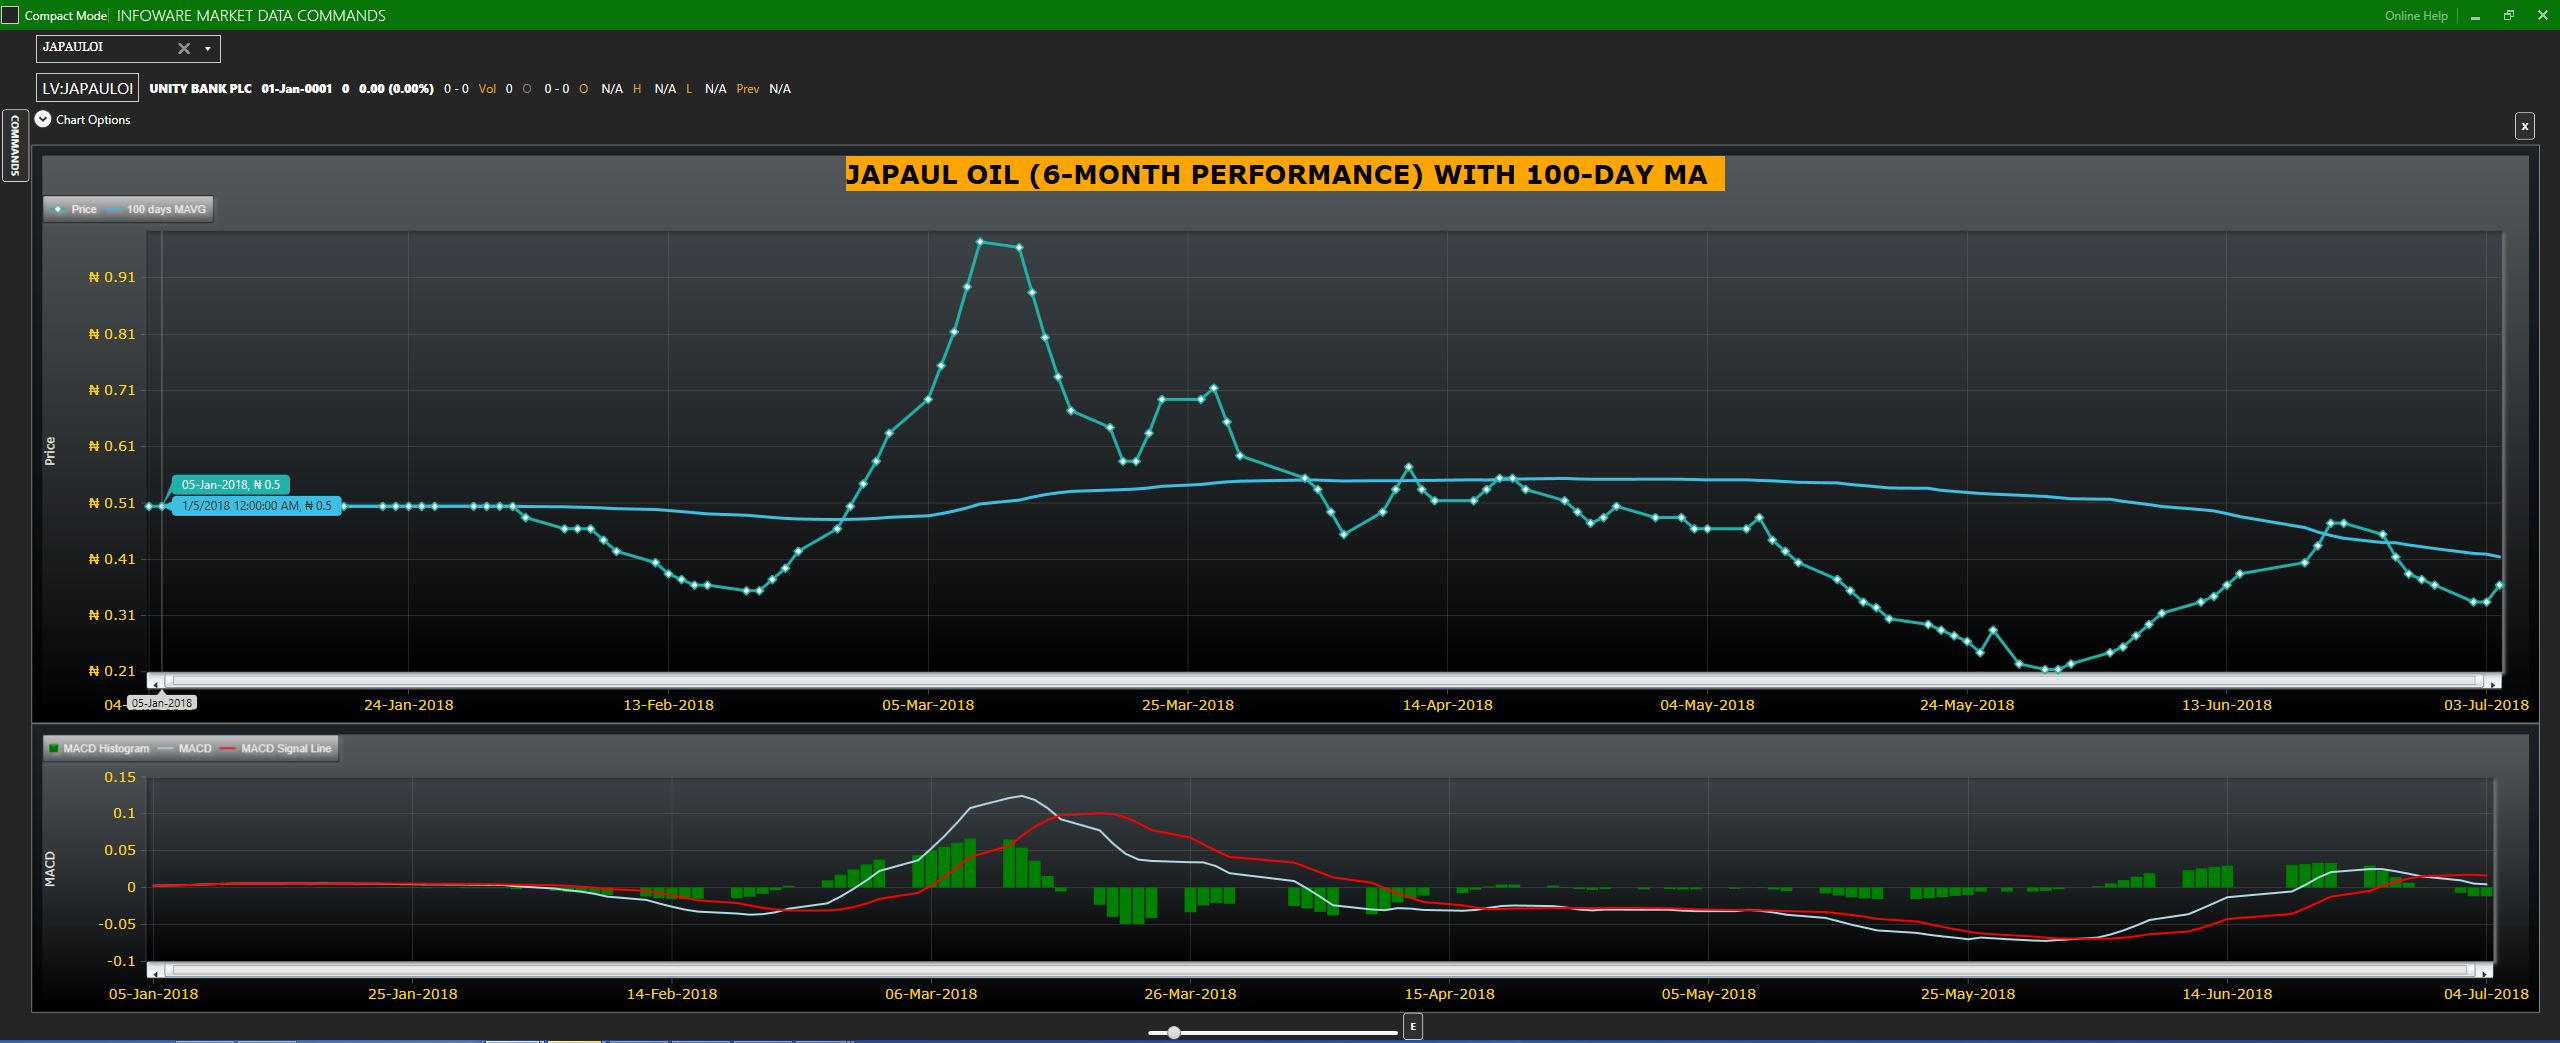 Japaul oil stock graph